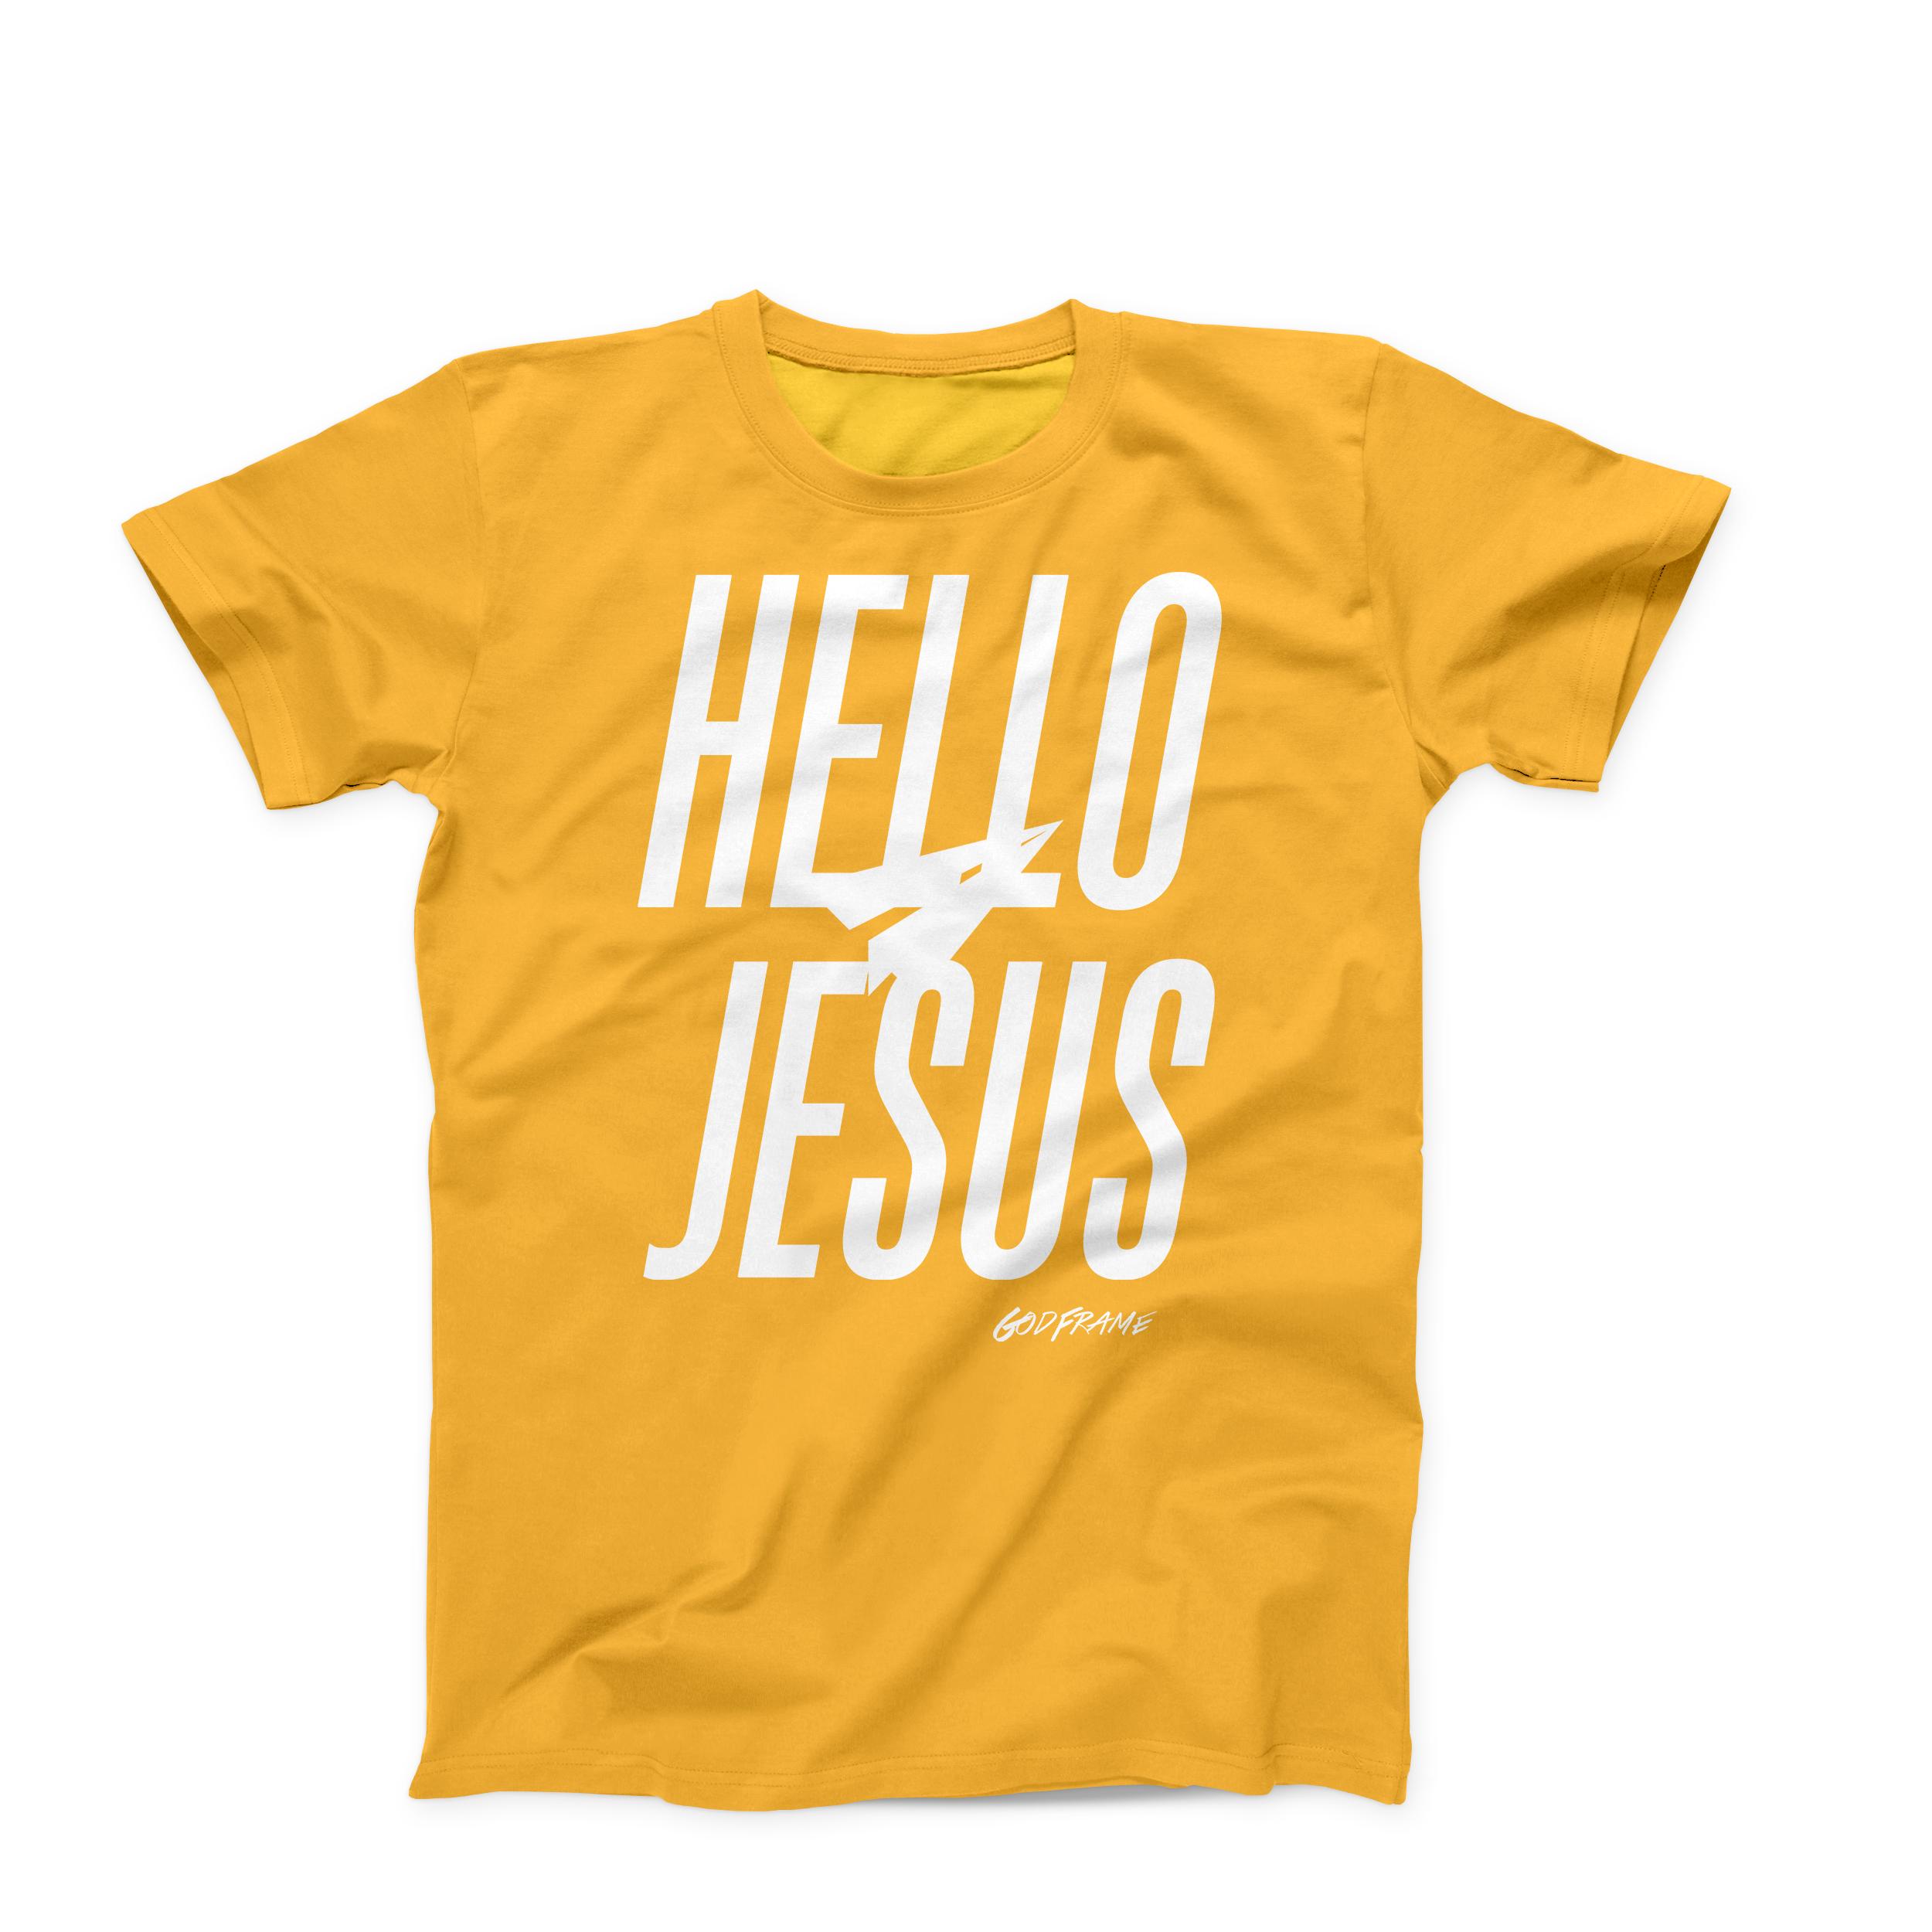 Hello Jesus - Logo T-Shirt - Yellow - Product Image.jpg